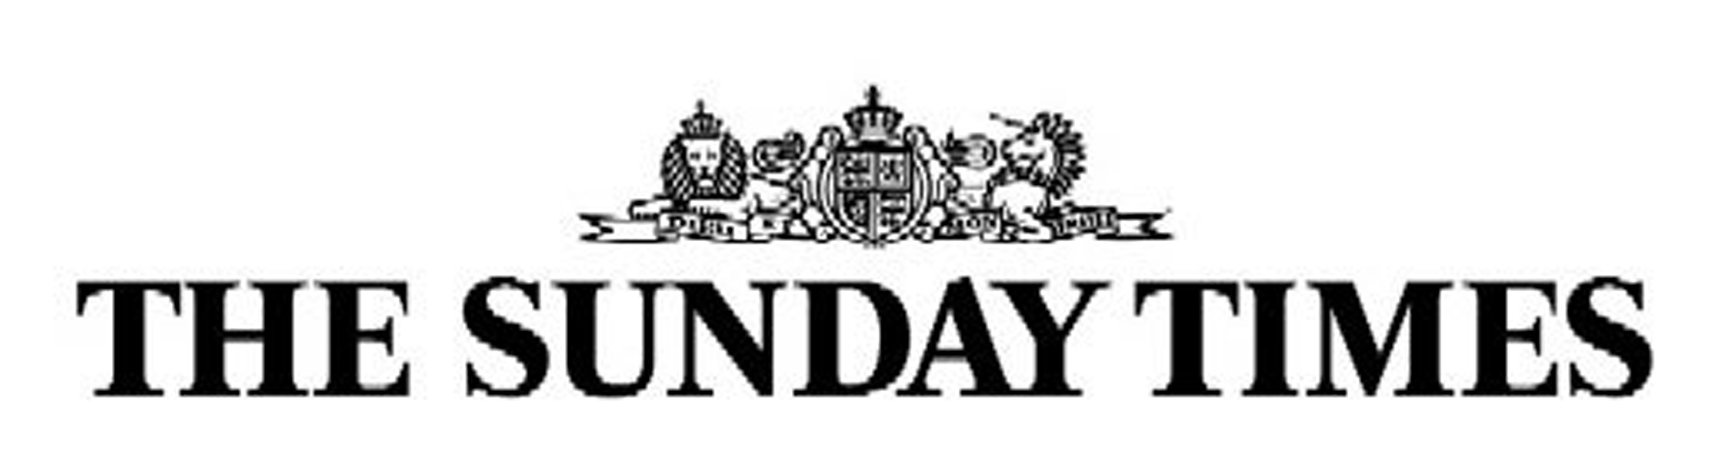 sunday-times-logo11.jpg